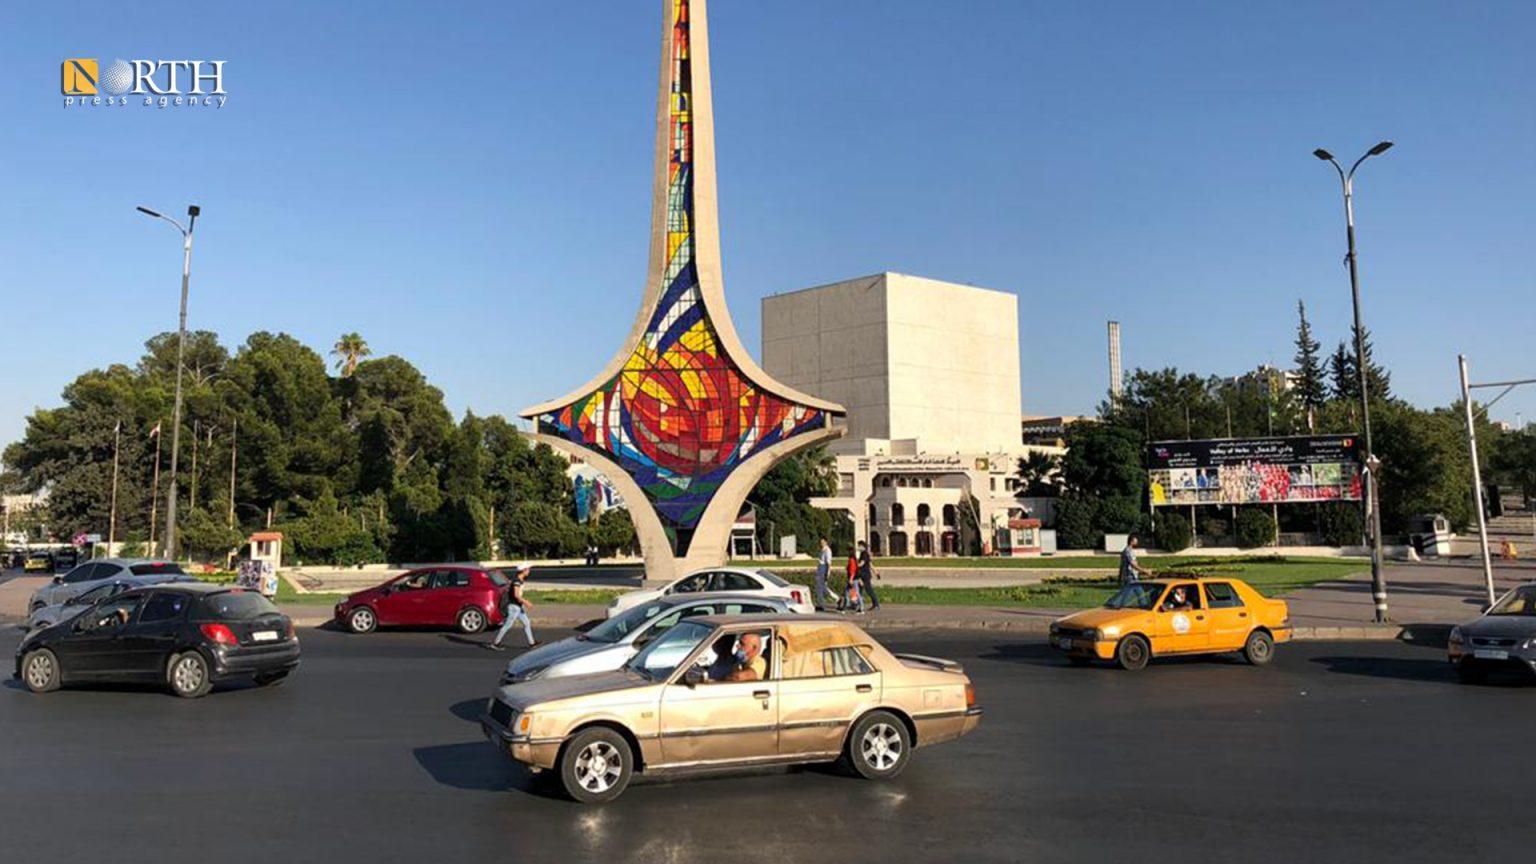 Umayyin Square in Damascus - North Press